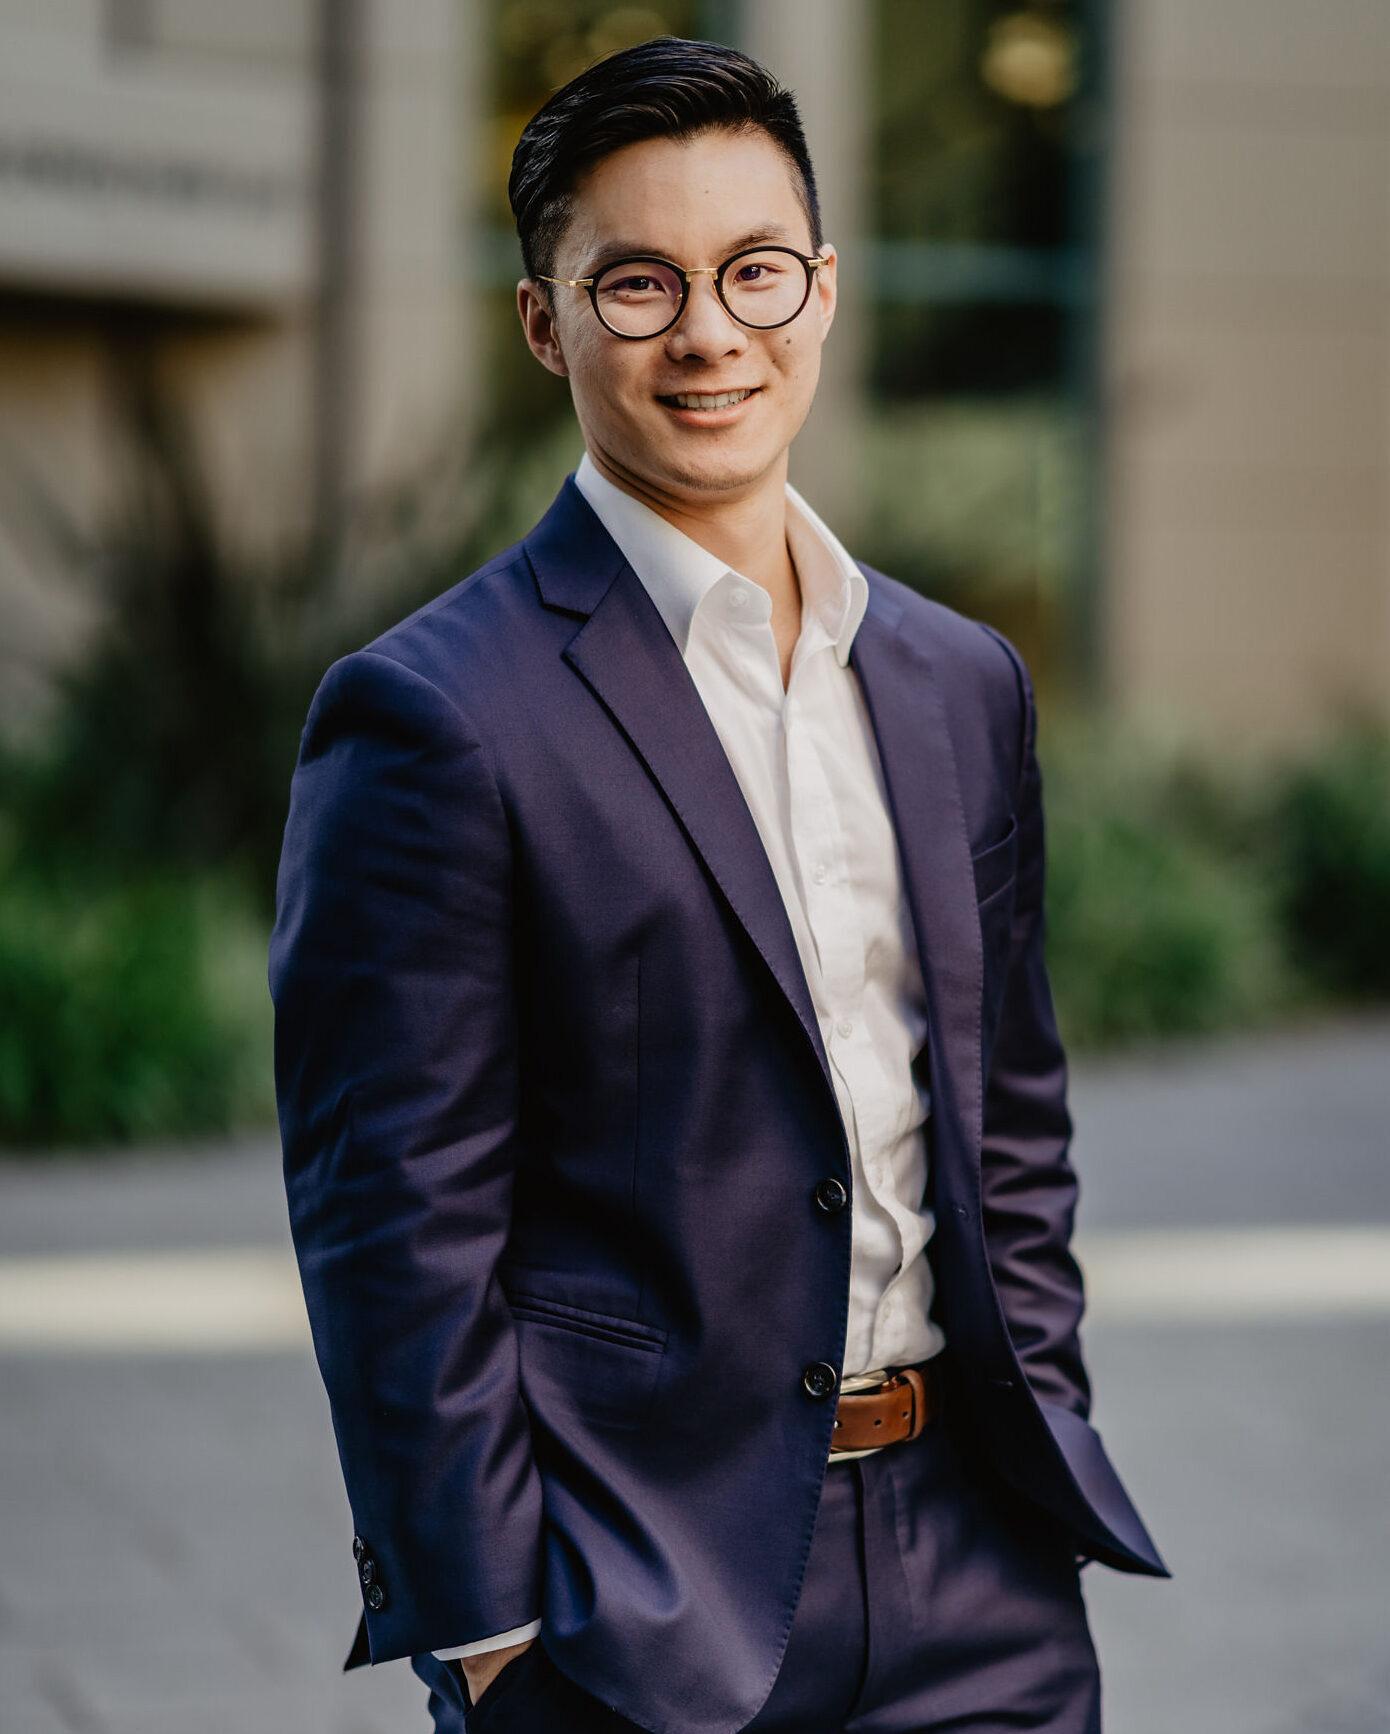 Darion Lee -- Senior Associate -- Acquisitions & Finance (4-5 AR Crop)